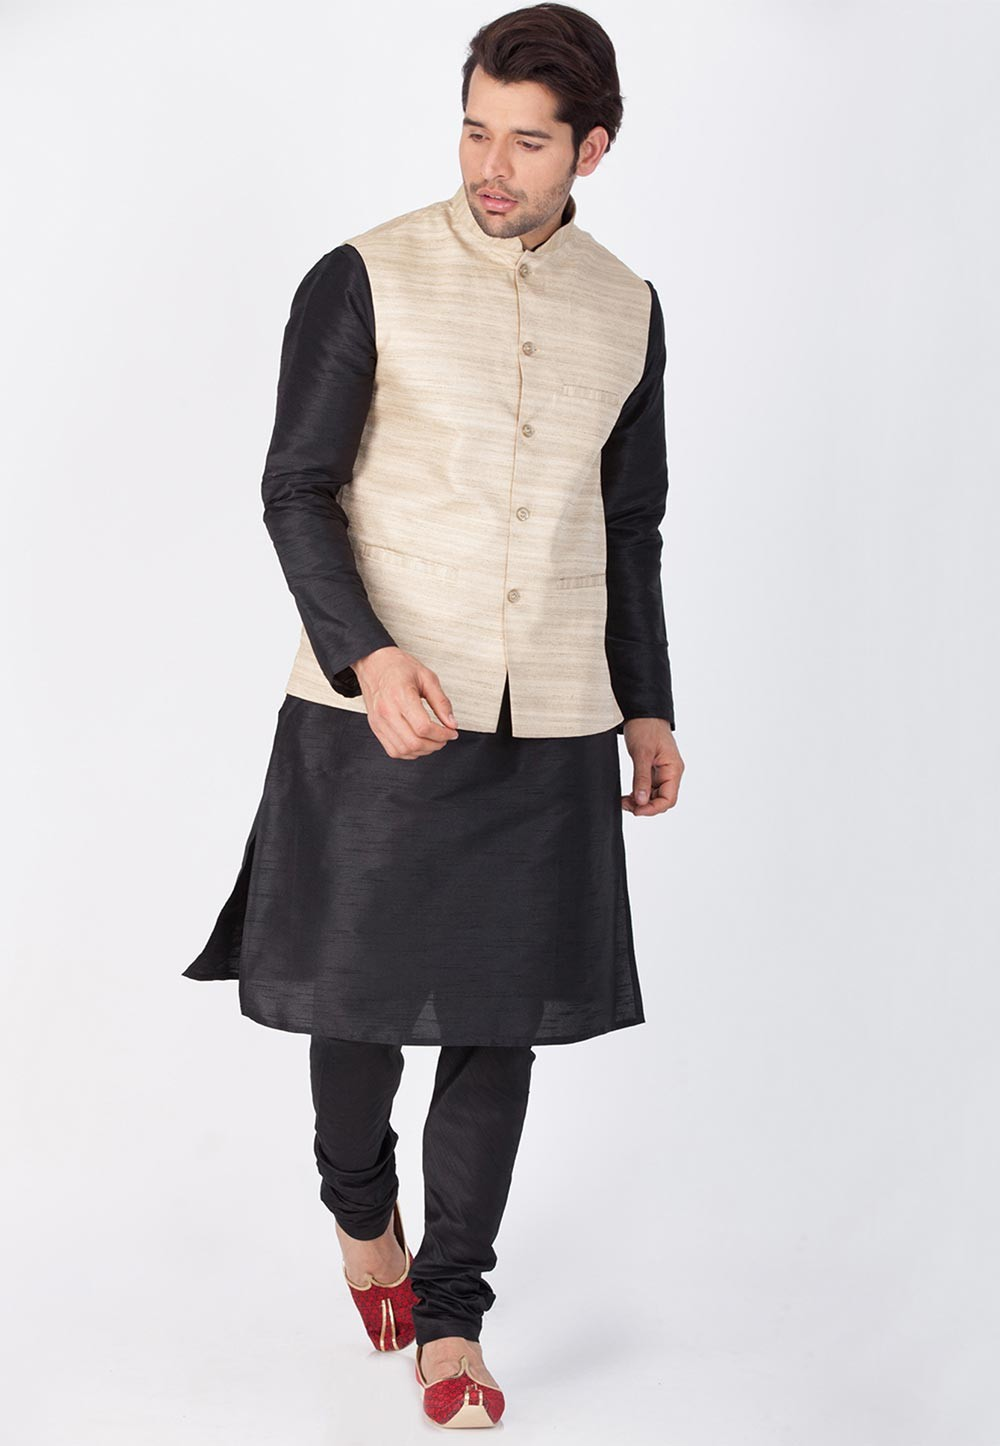 Black,Beige Color Readymade Latest Kurta Pajama with Nehru Jacket